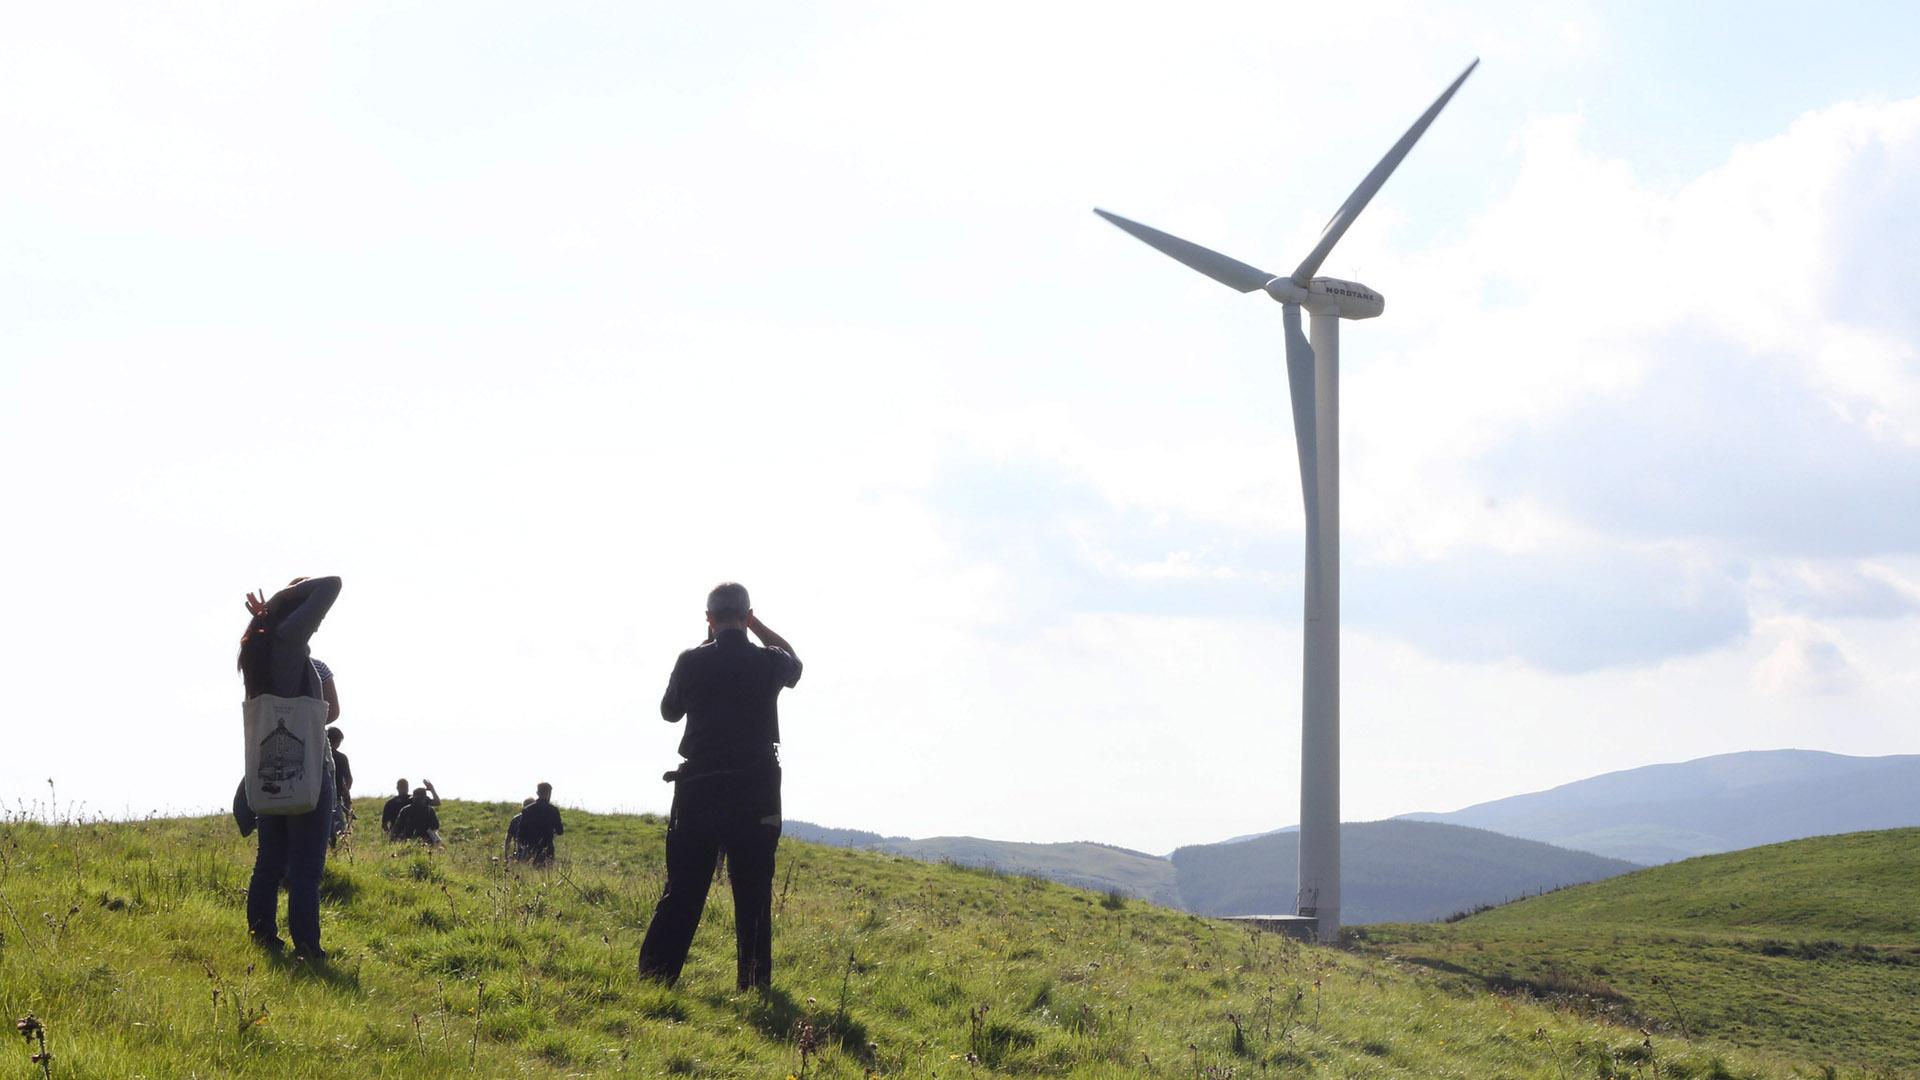 CAT students walking towards a wind turbine